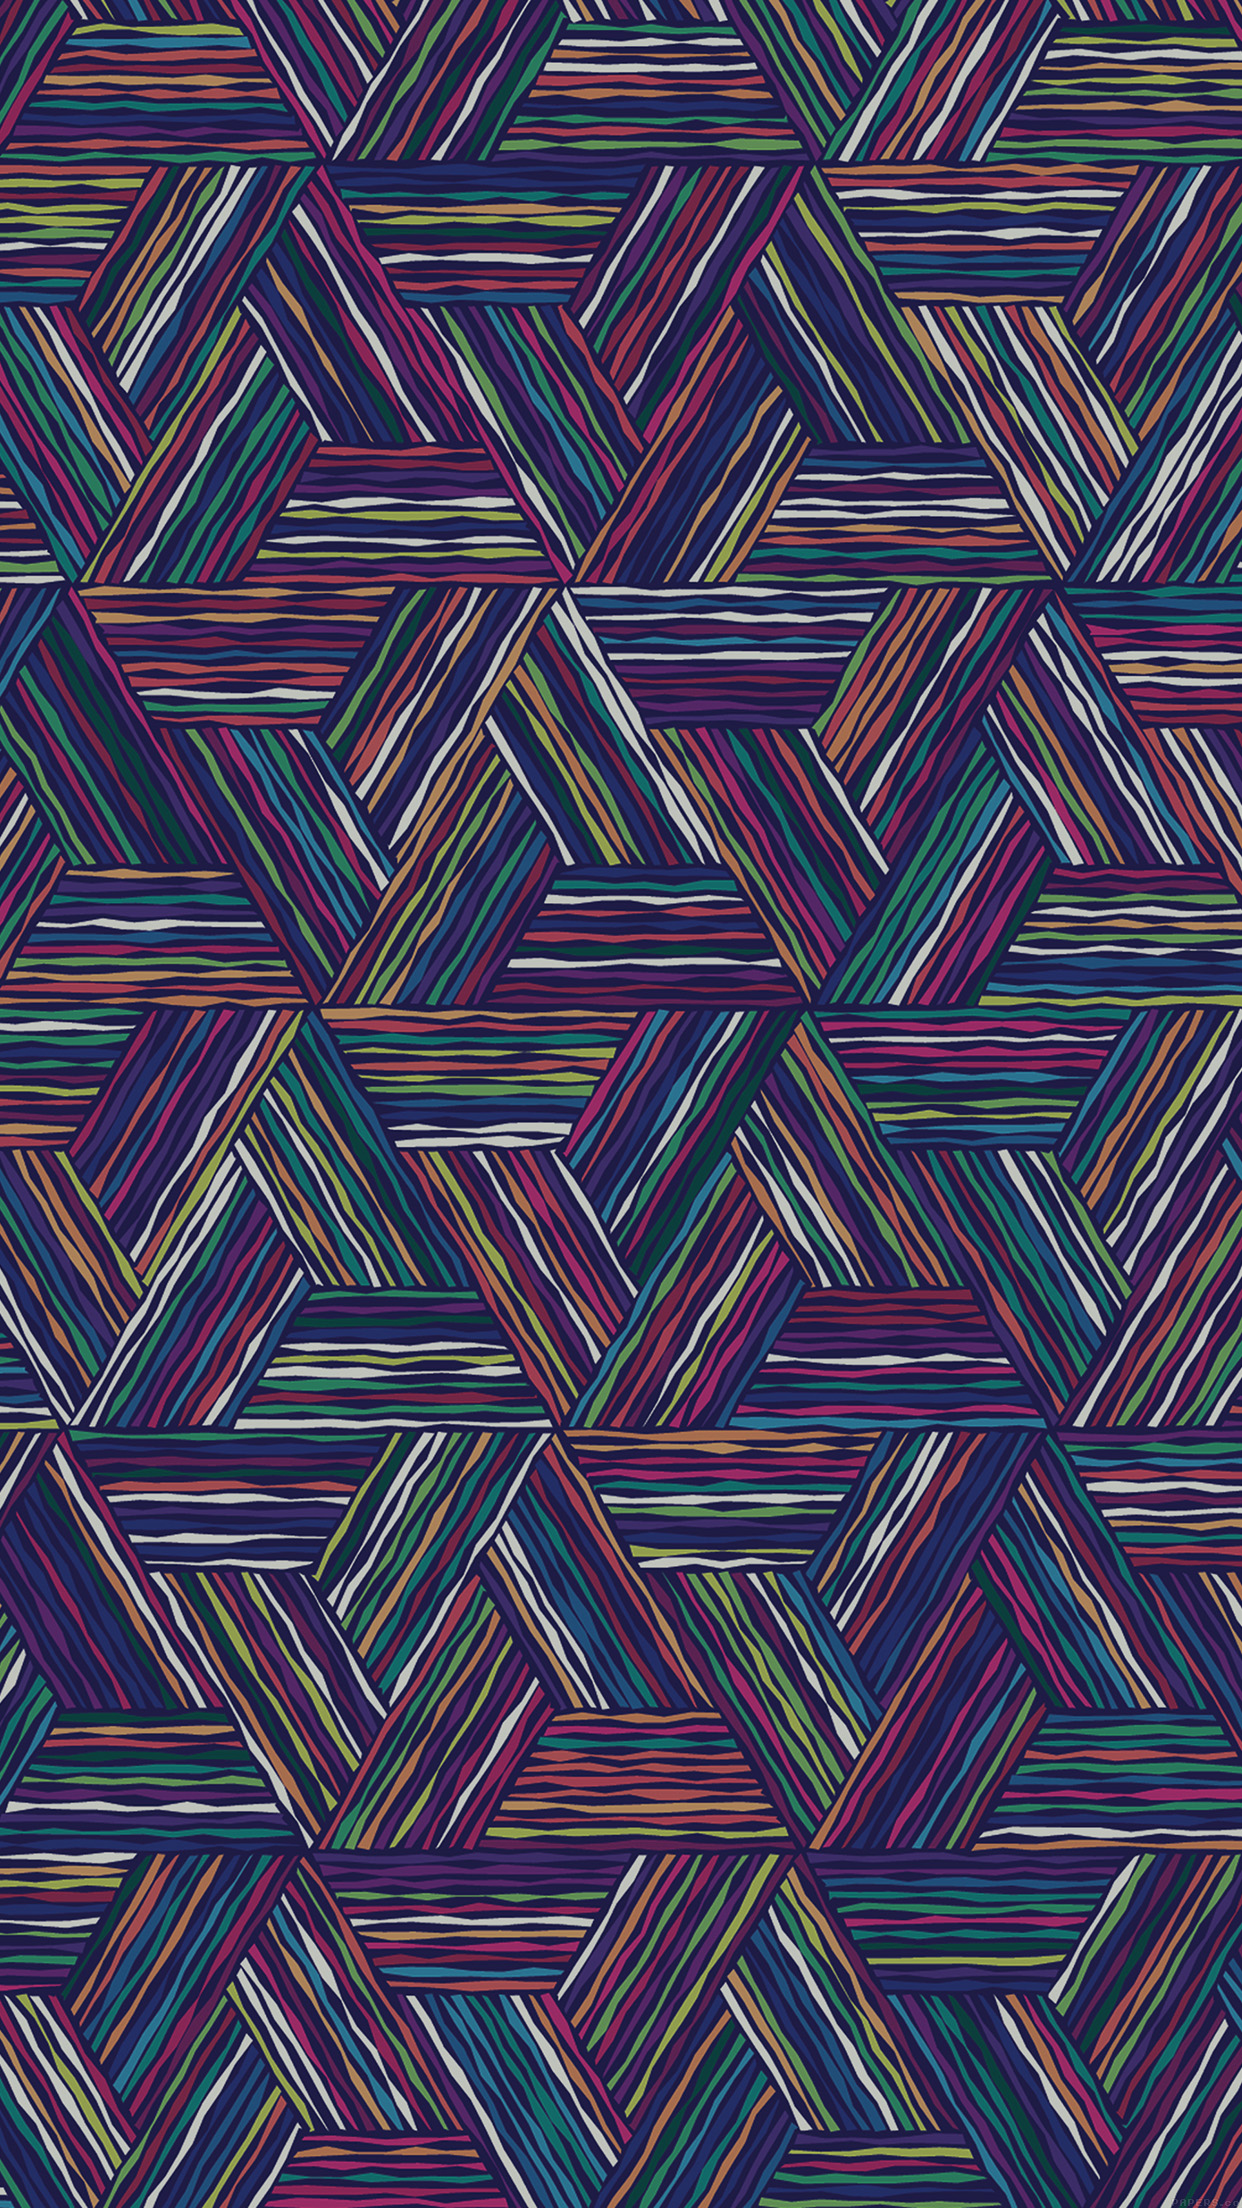 Cool Vaporwave Iphone Wallpaper Tumblr70 Fondos T